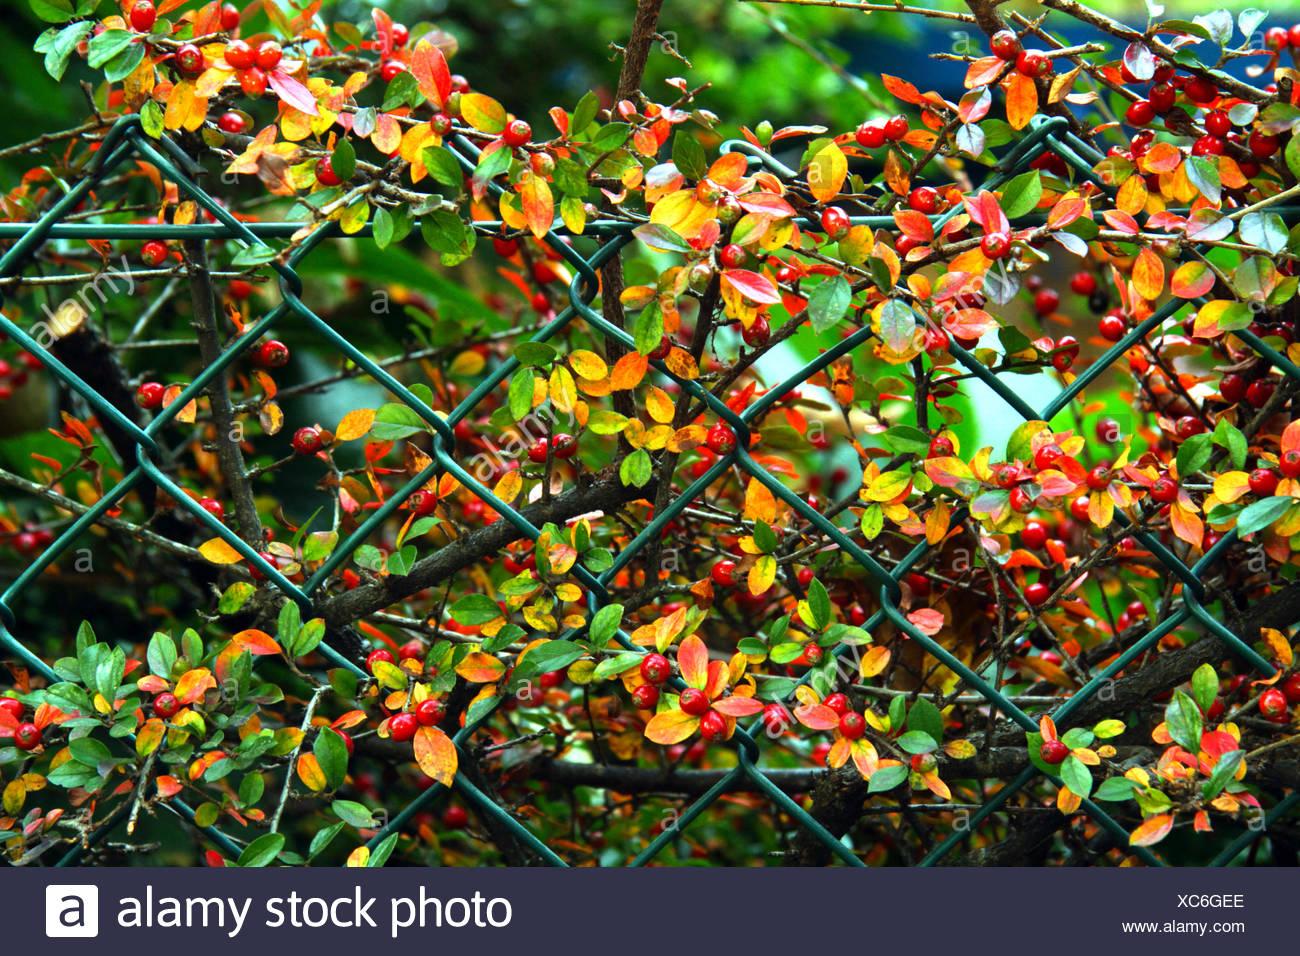 Red Mesh Fence Stockfotos & Red Mesh Fence Bilder - Alamy